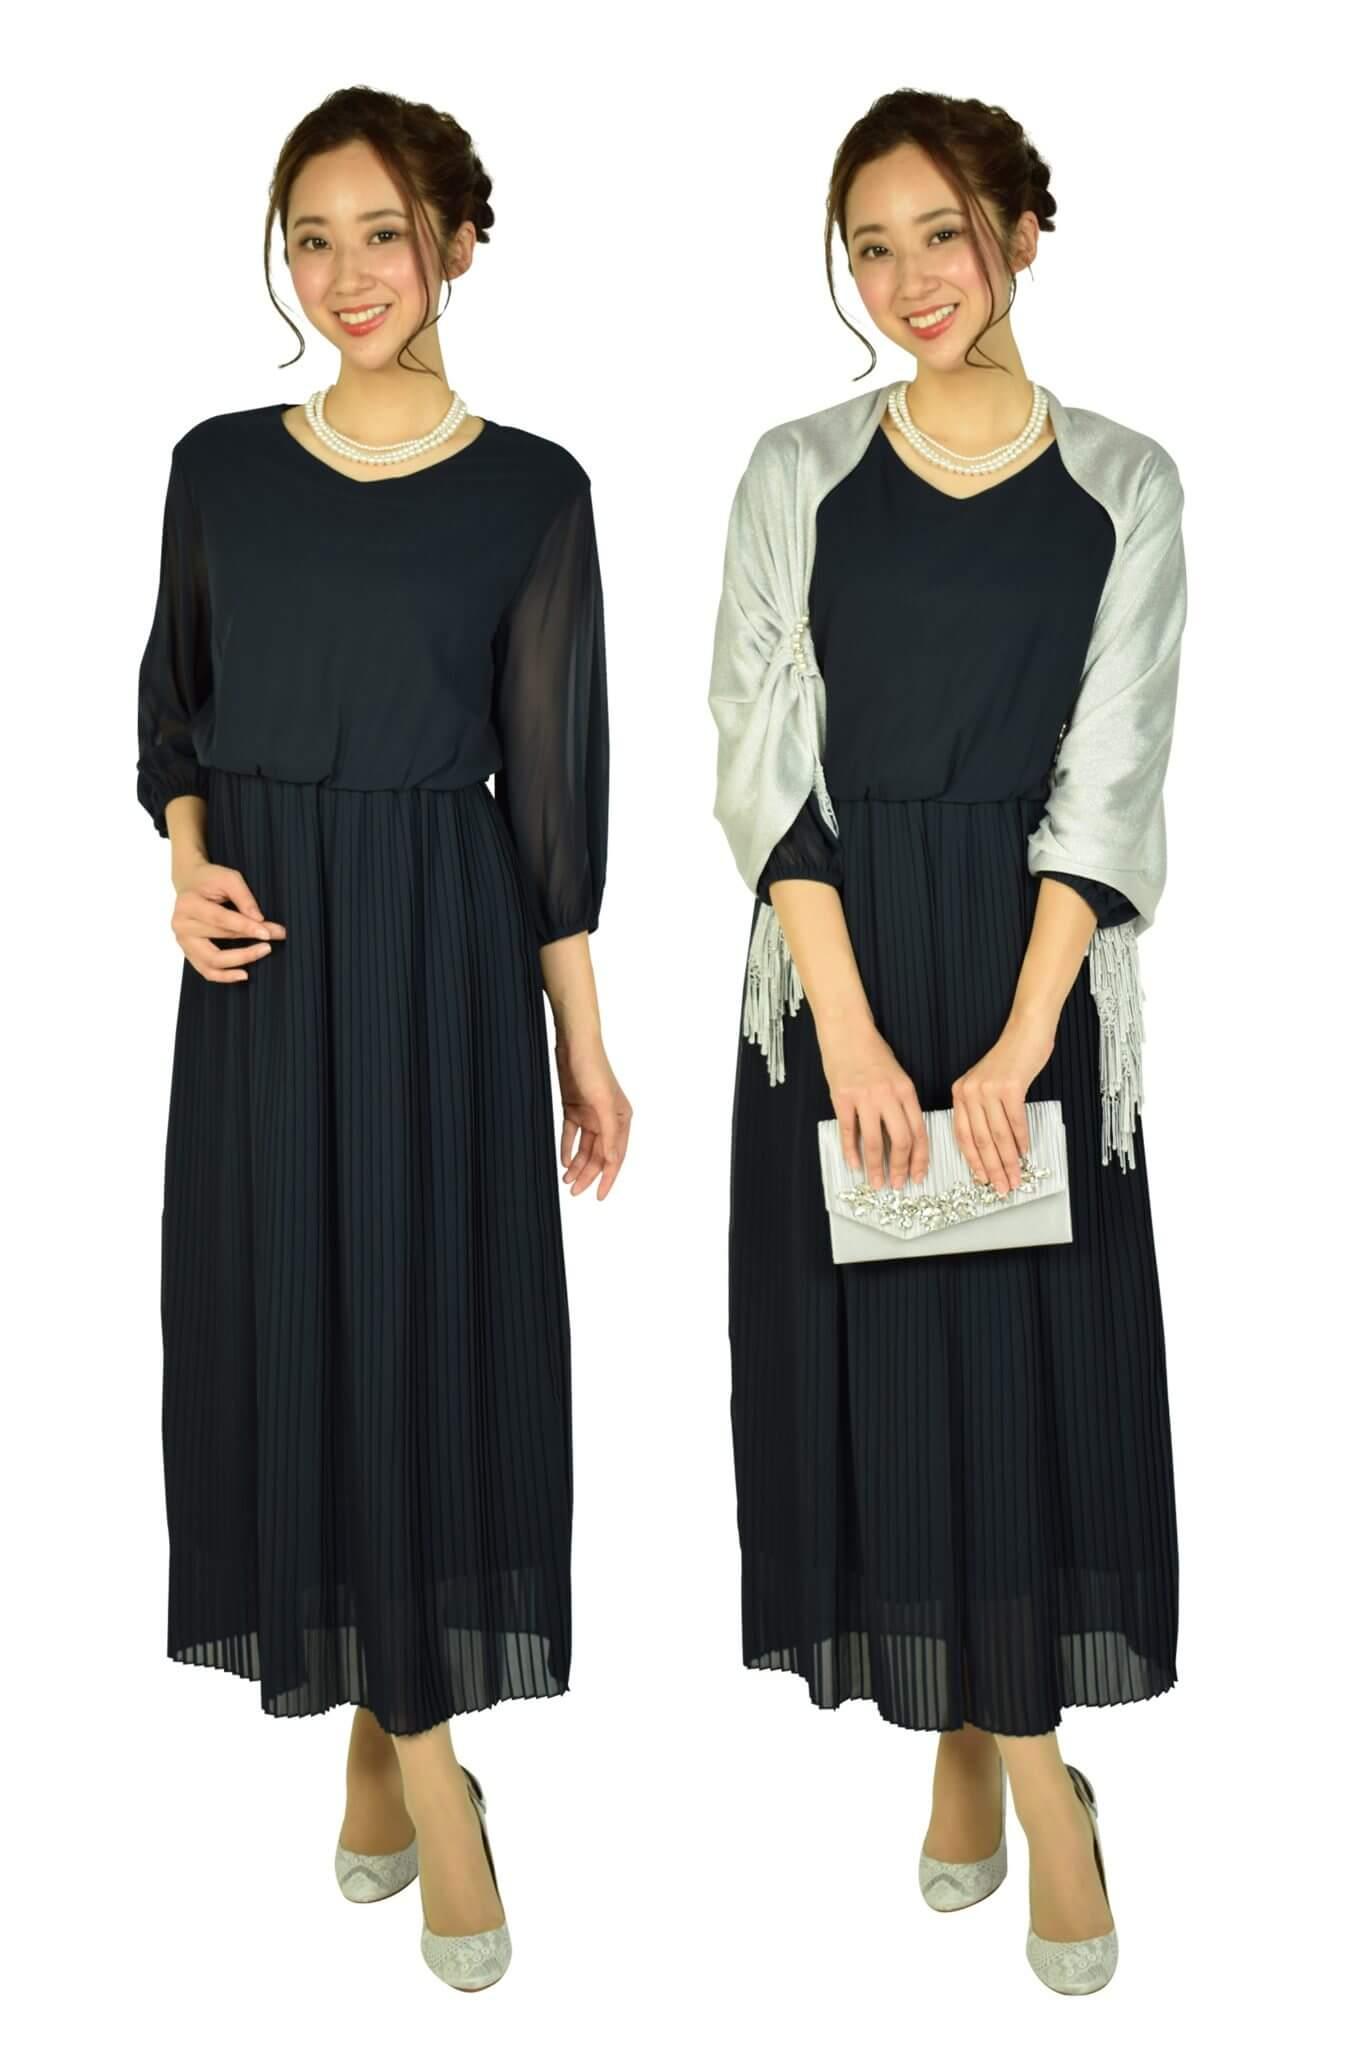 FeteROBEエアリー袖付きネイビードレス